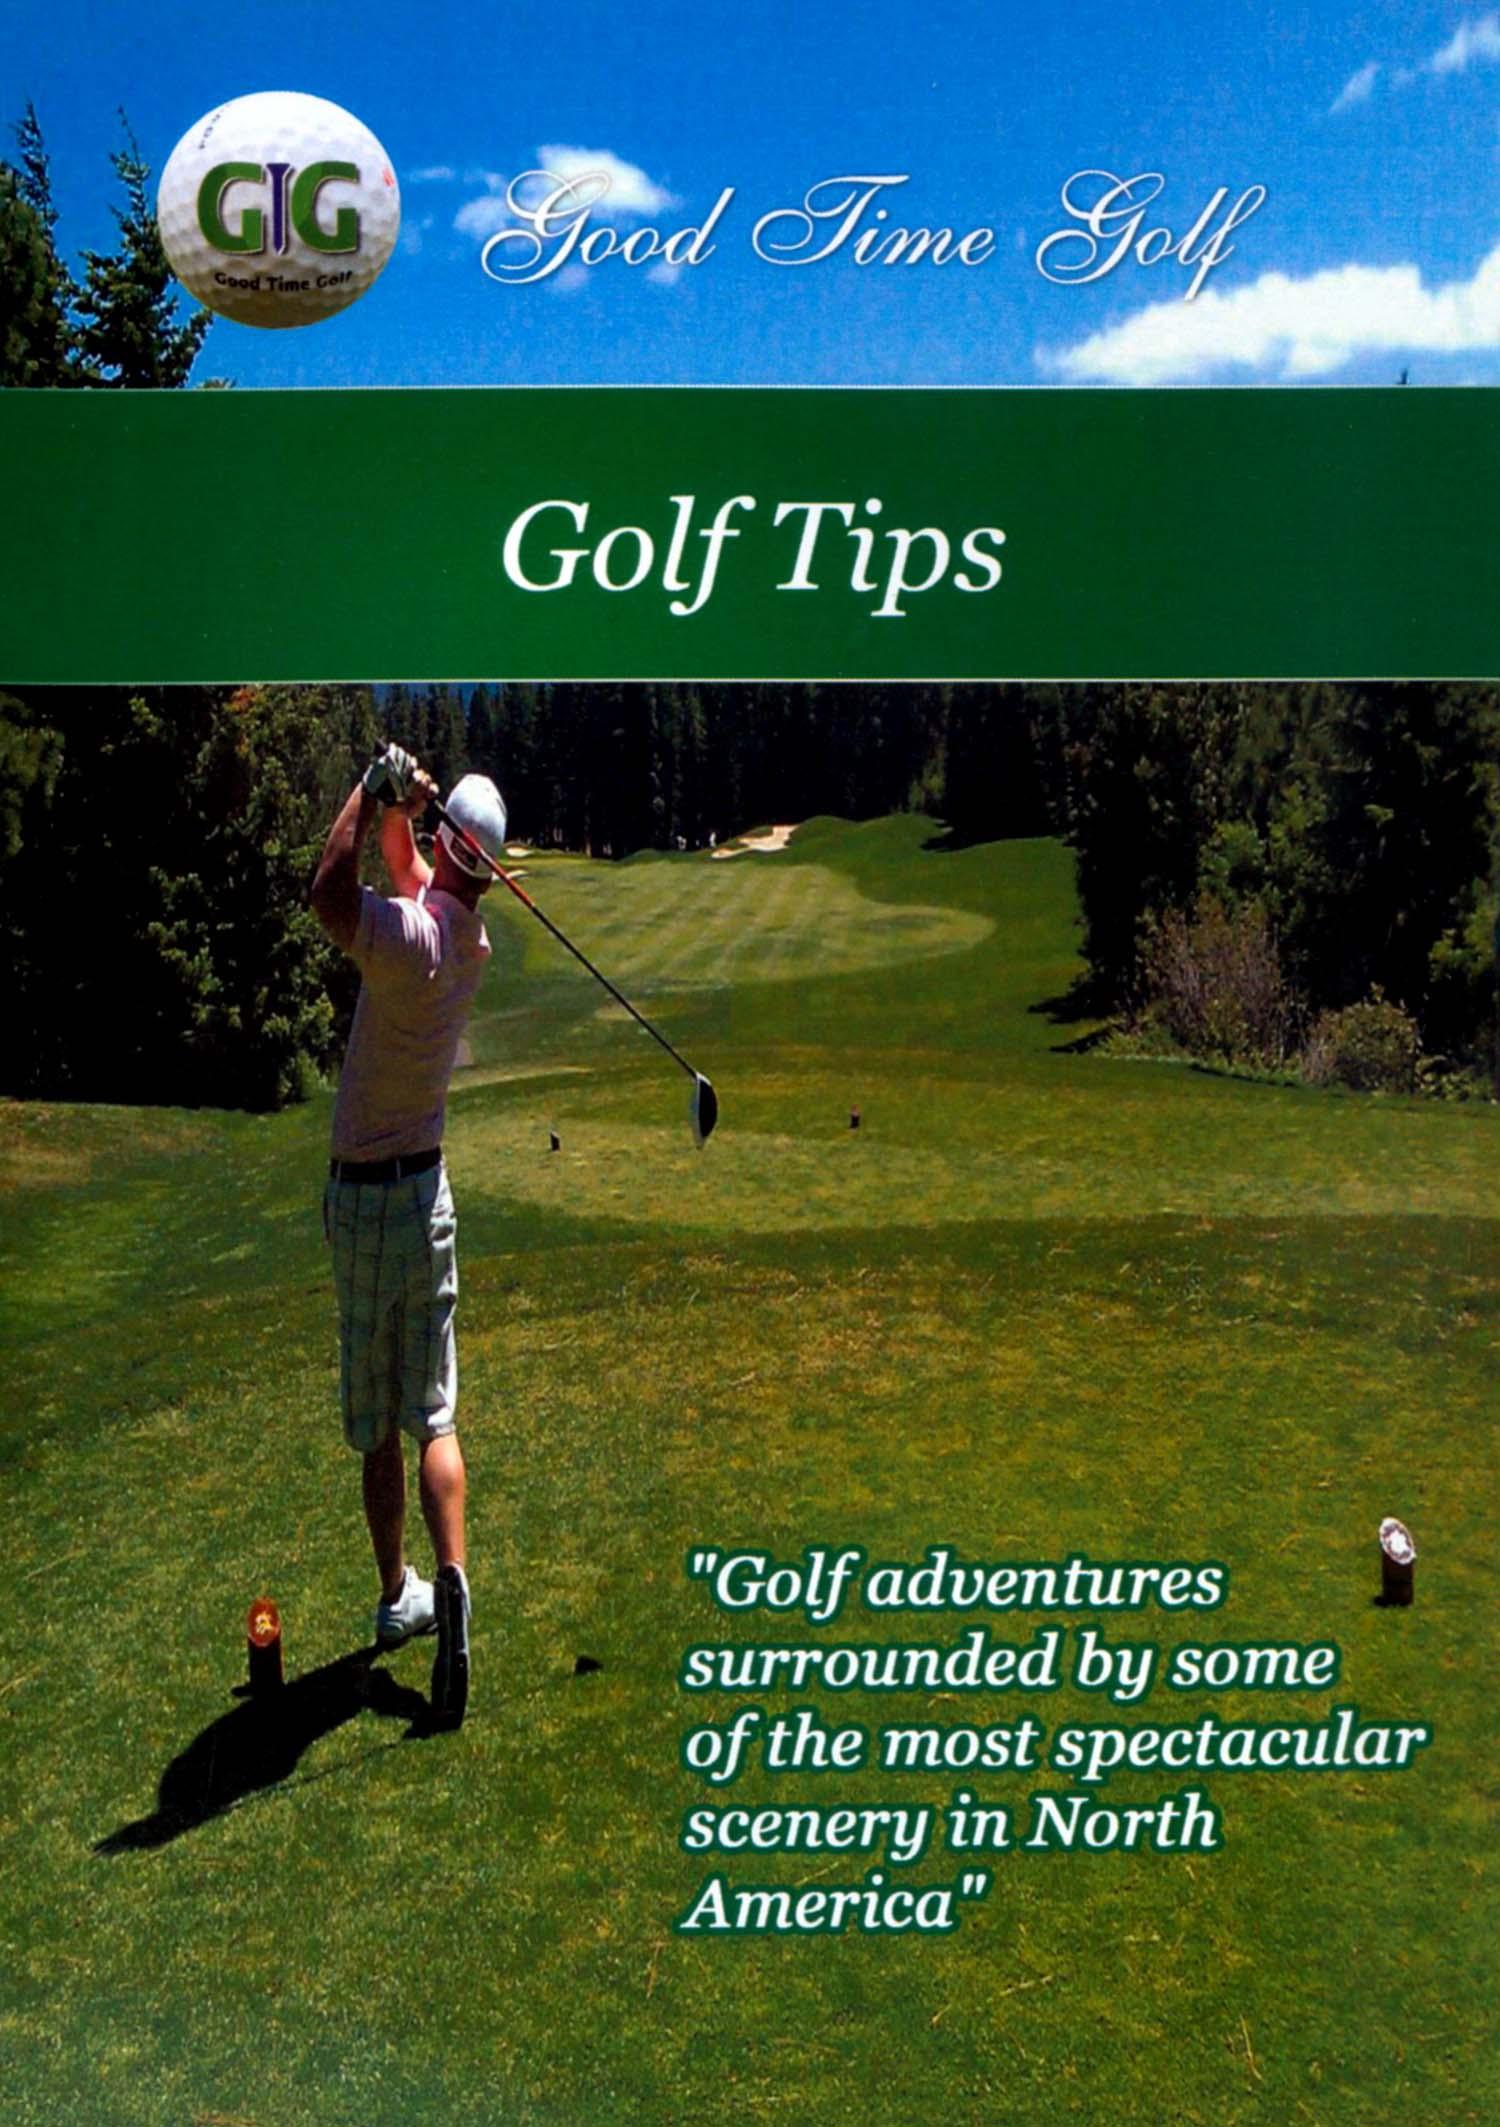 Good Time Golf: Golf Tips